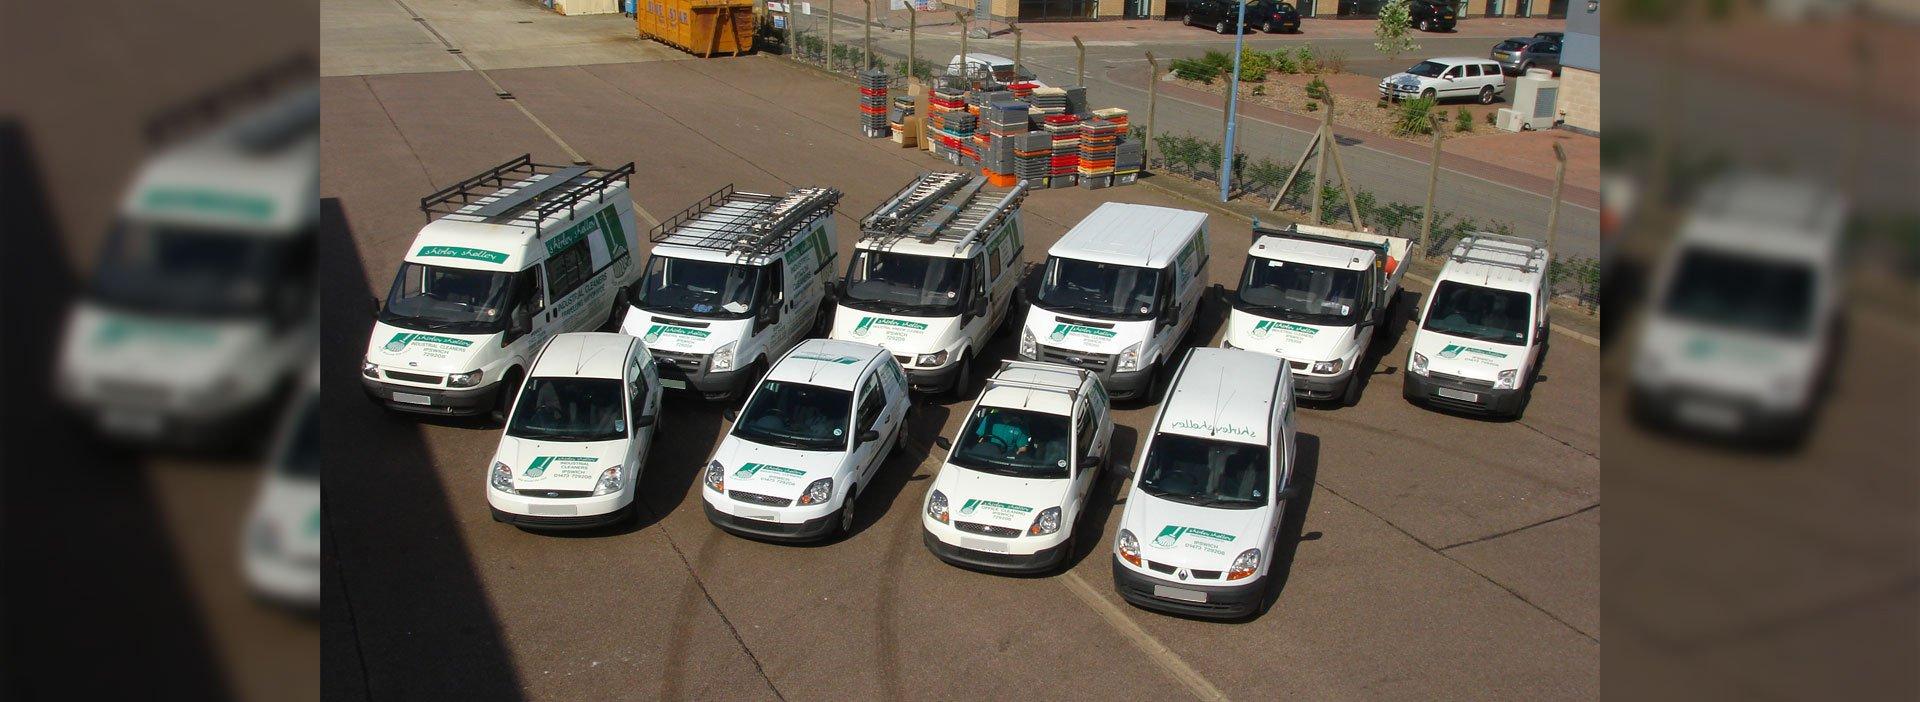 Shirley Shelley vehicle fleet